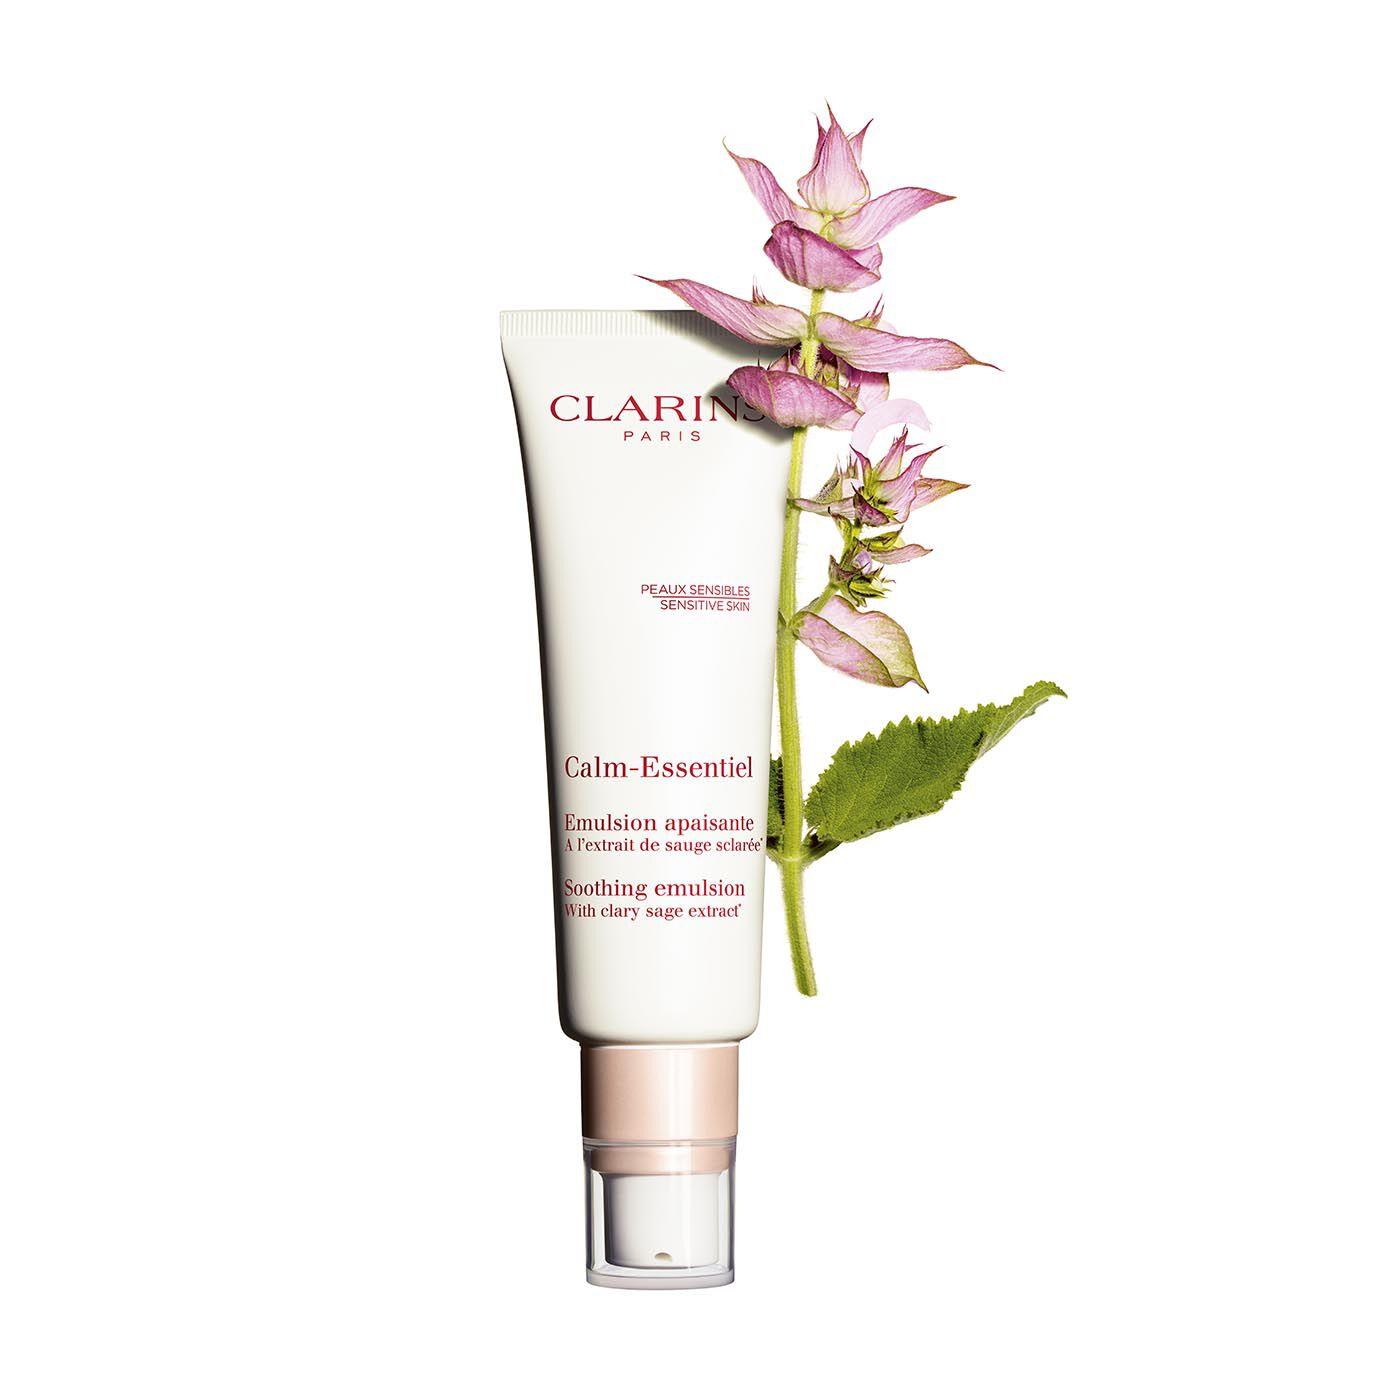 Calm-Essentiel Emulsion apaisante Beruhigende Emulsion für sensible Haut